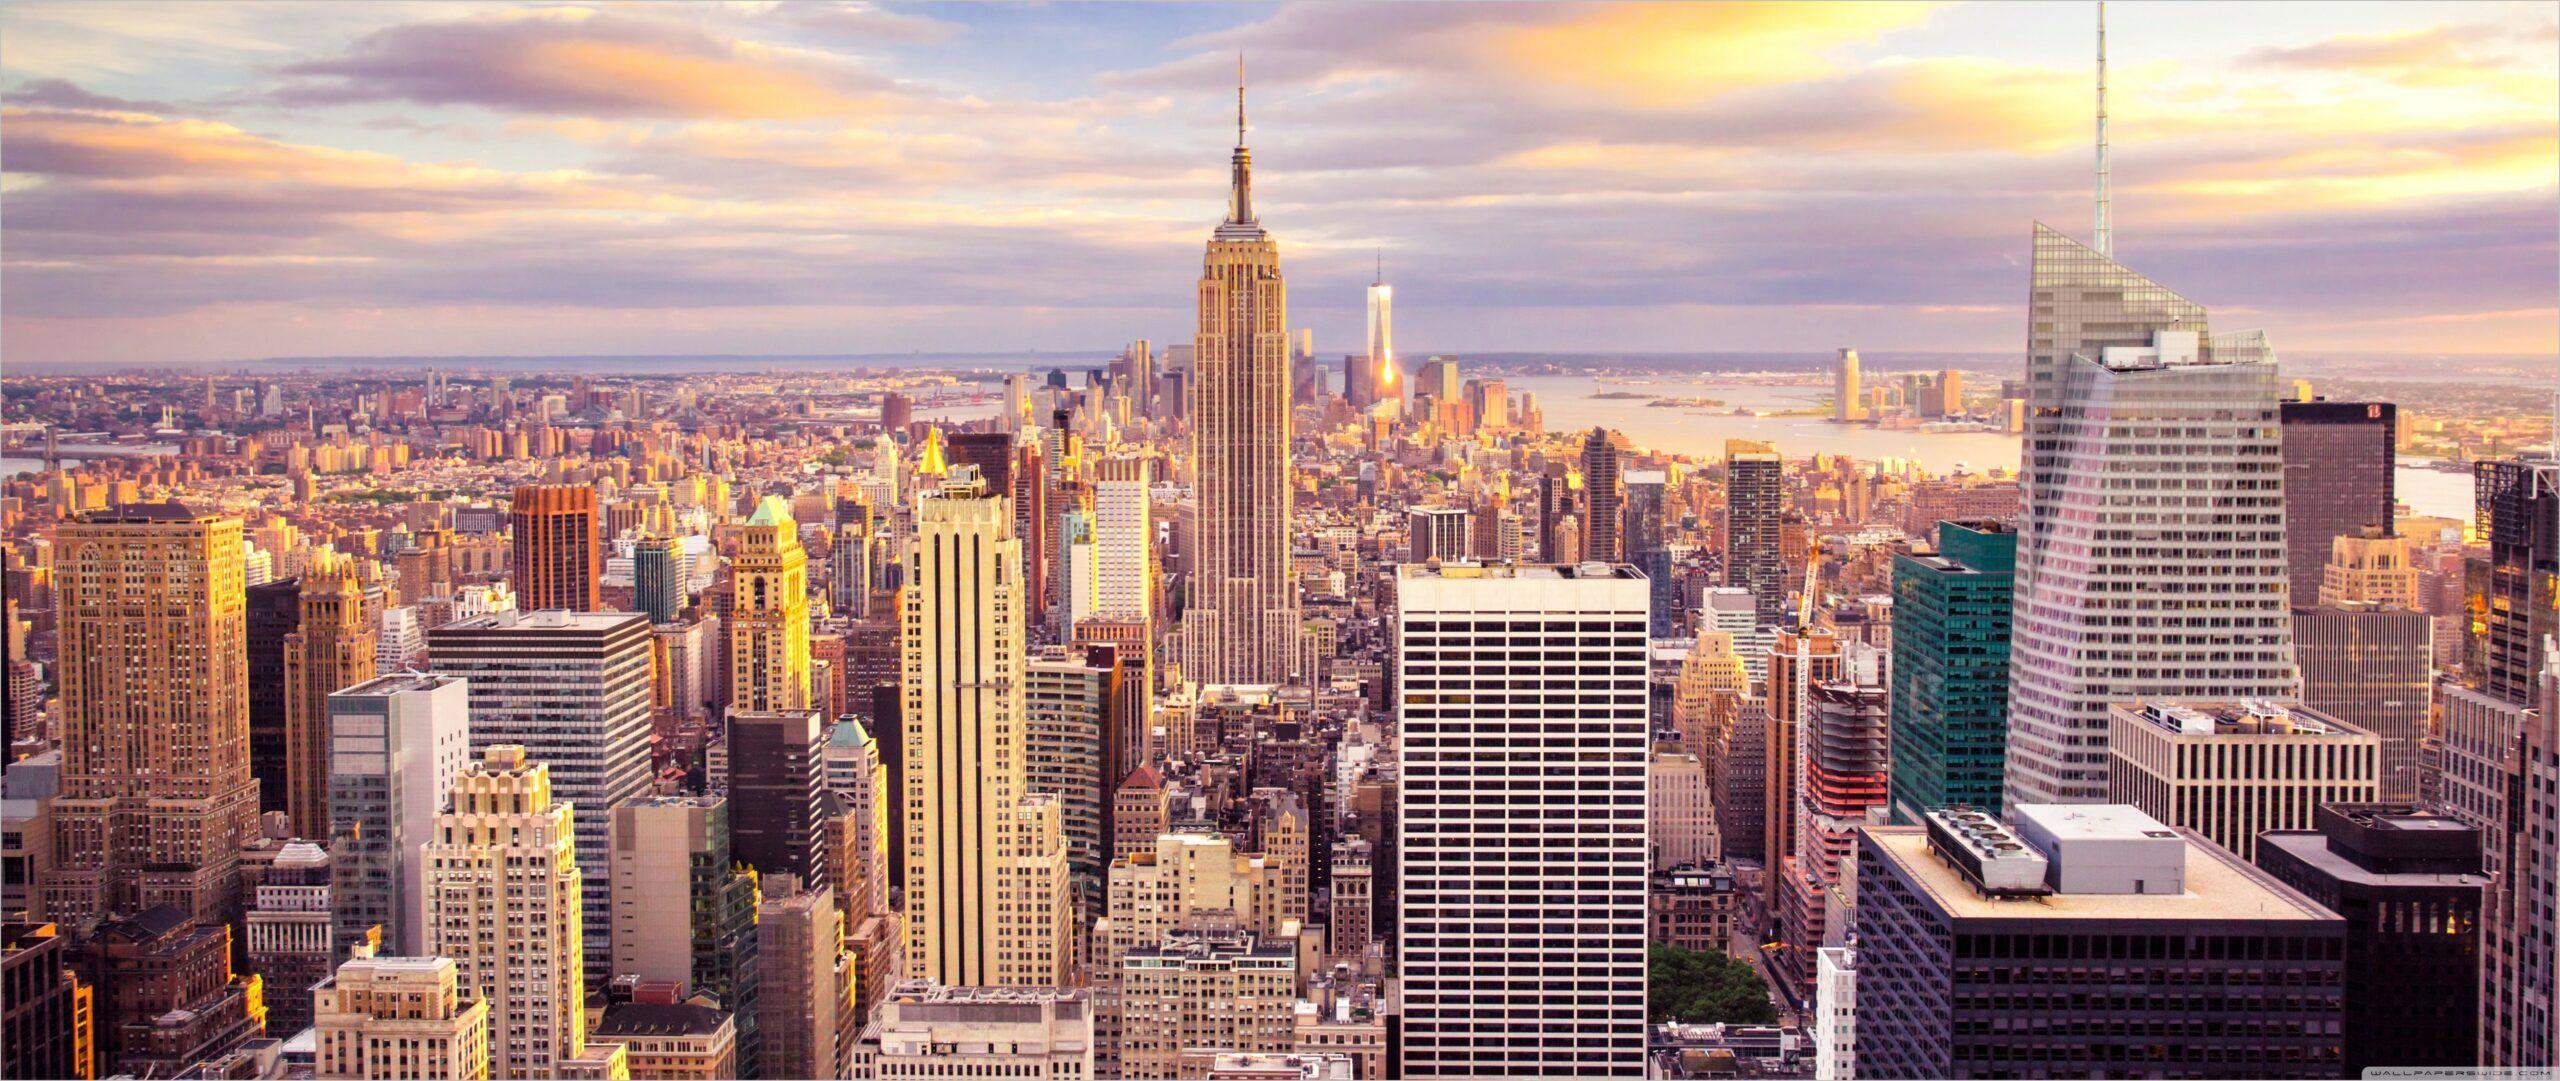 New York City 4k Wallpaper City Wallpaper New York Wallpaper York Wallpaper